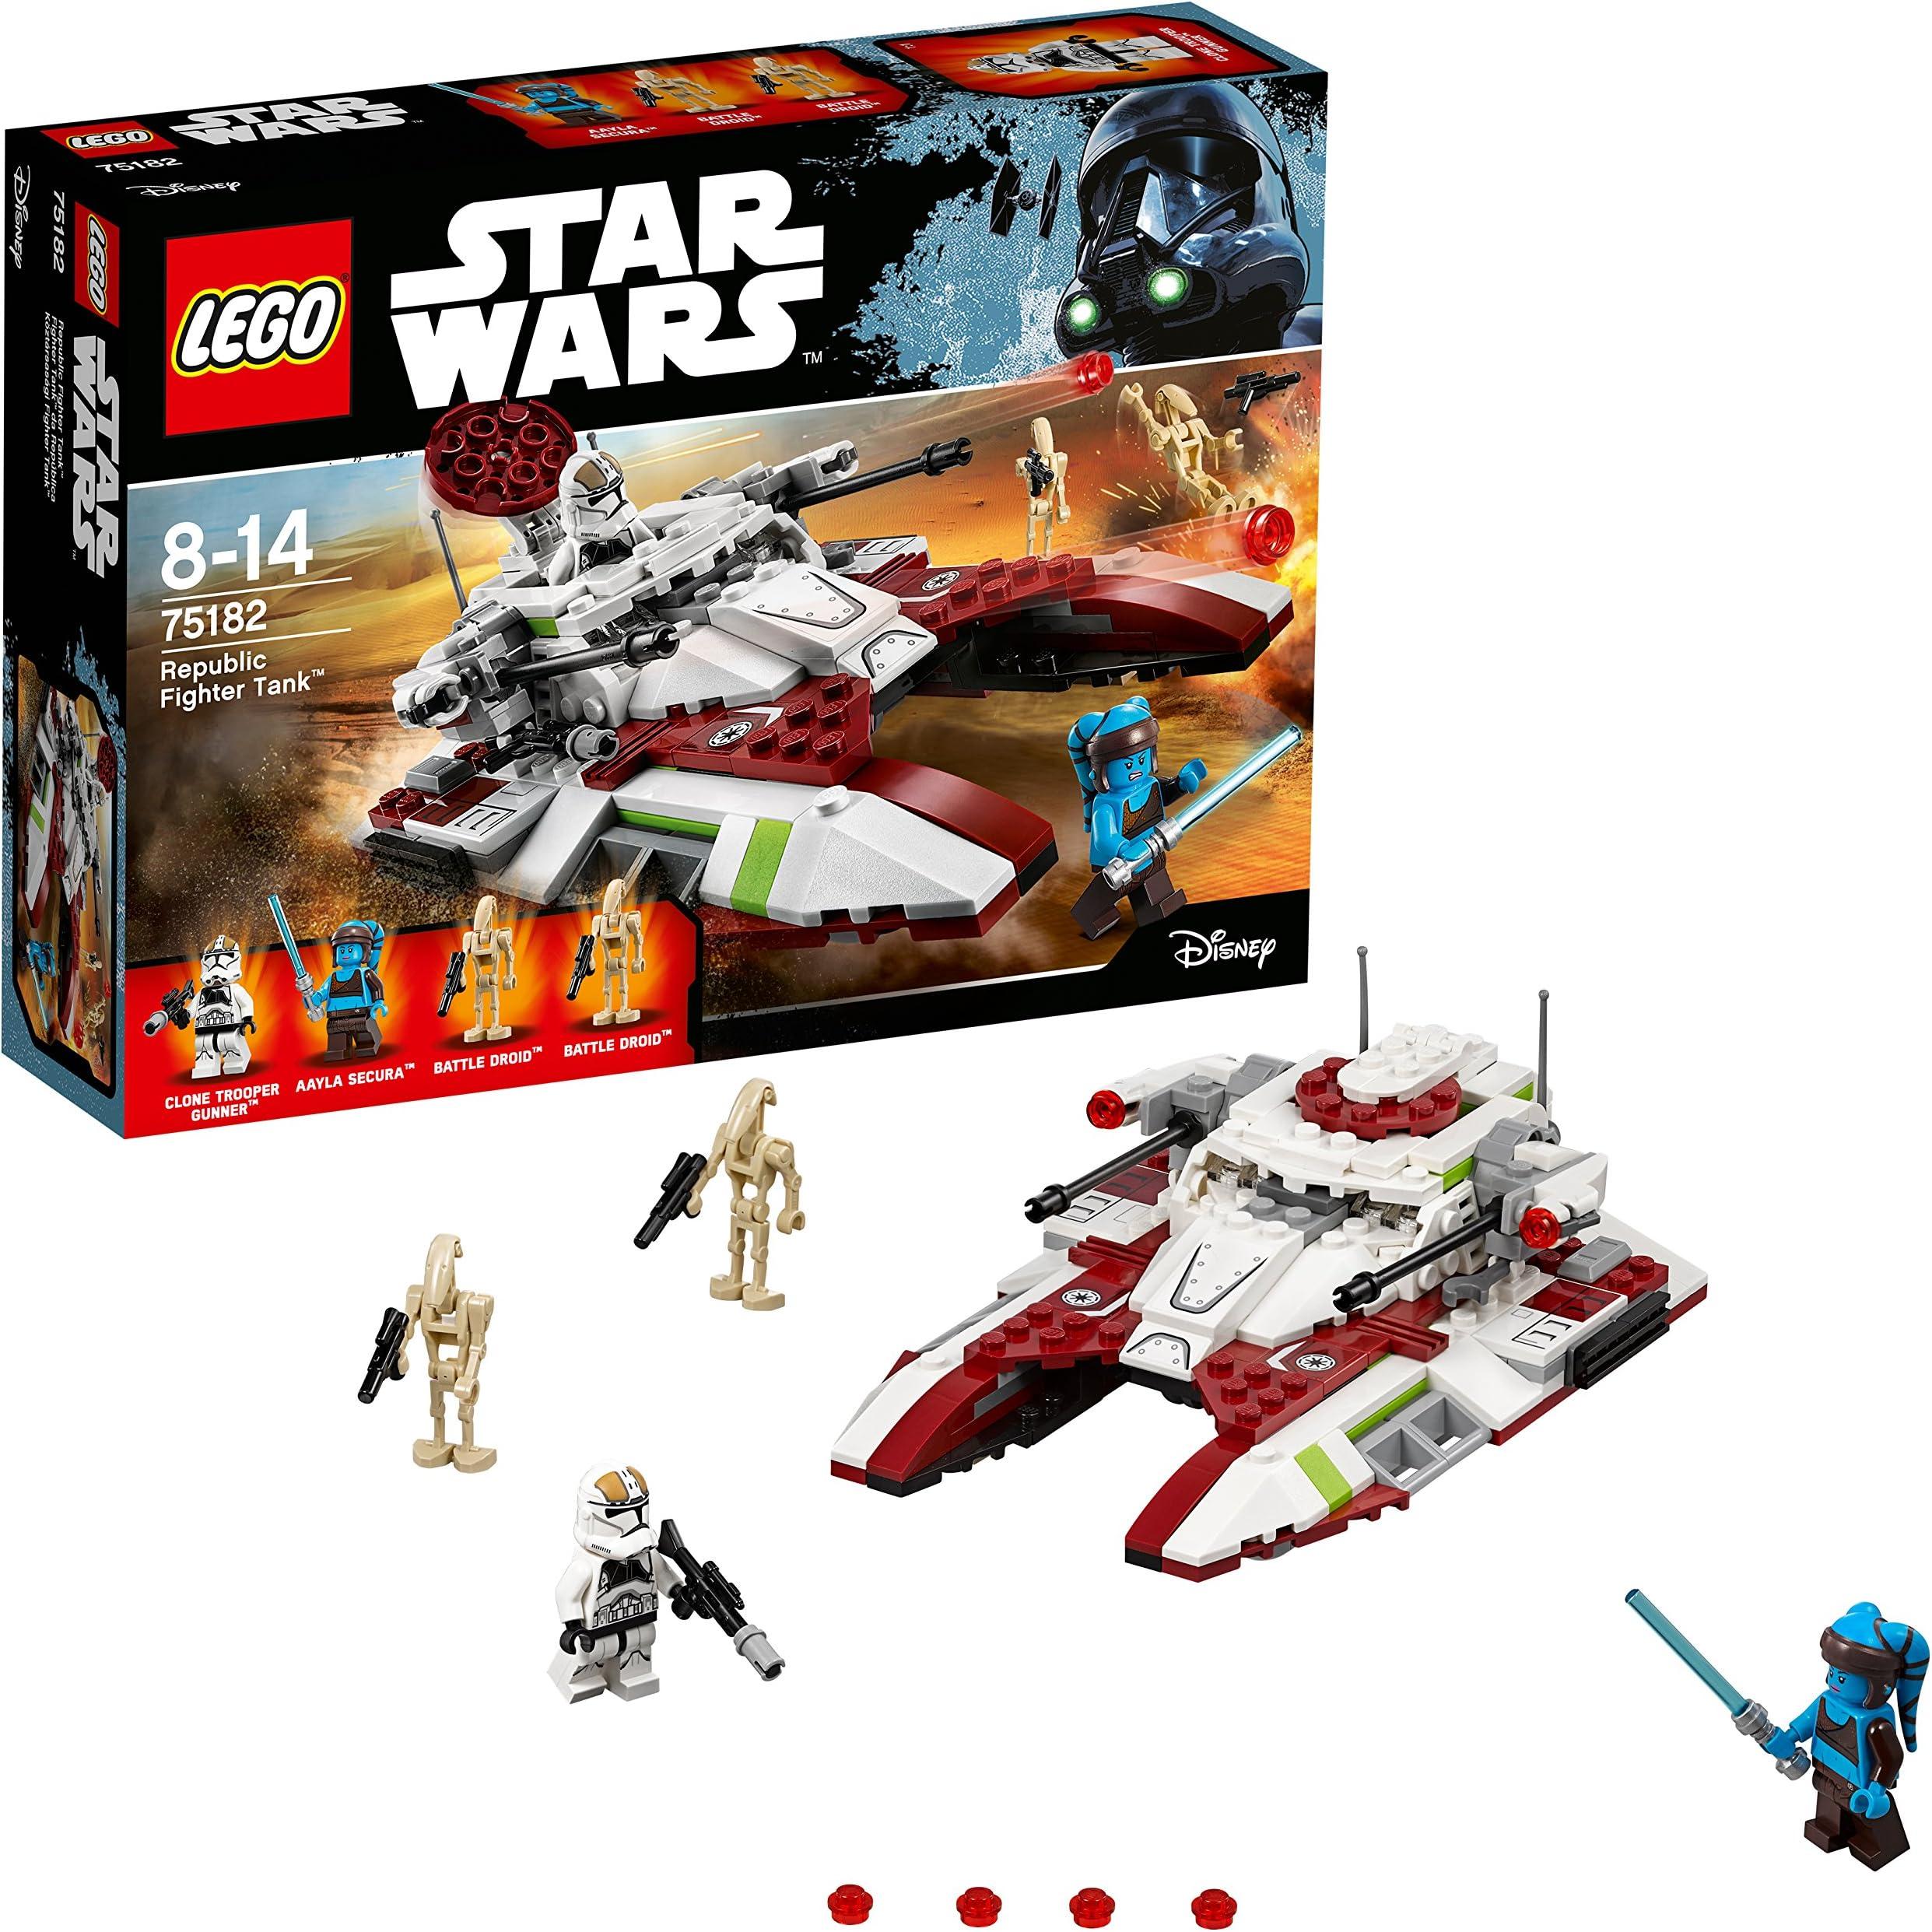 Roblox Sharkbite Duck Boat Toy Uk Lego Uk 75182 Republic Fighter Tank Construction Toy For Boys Price In Uae Amazon Uae Kanbkam